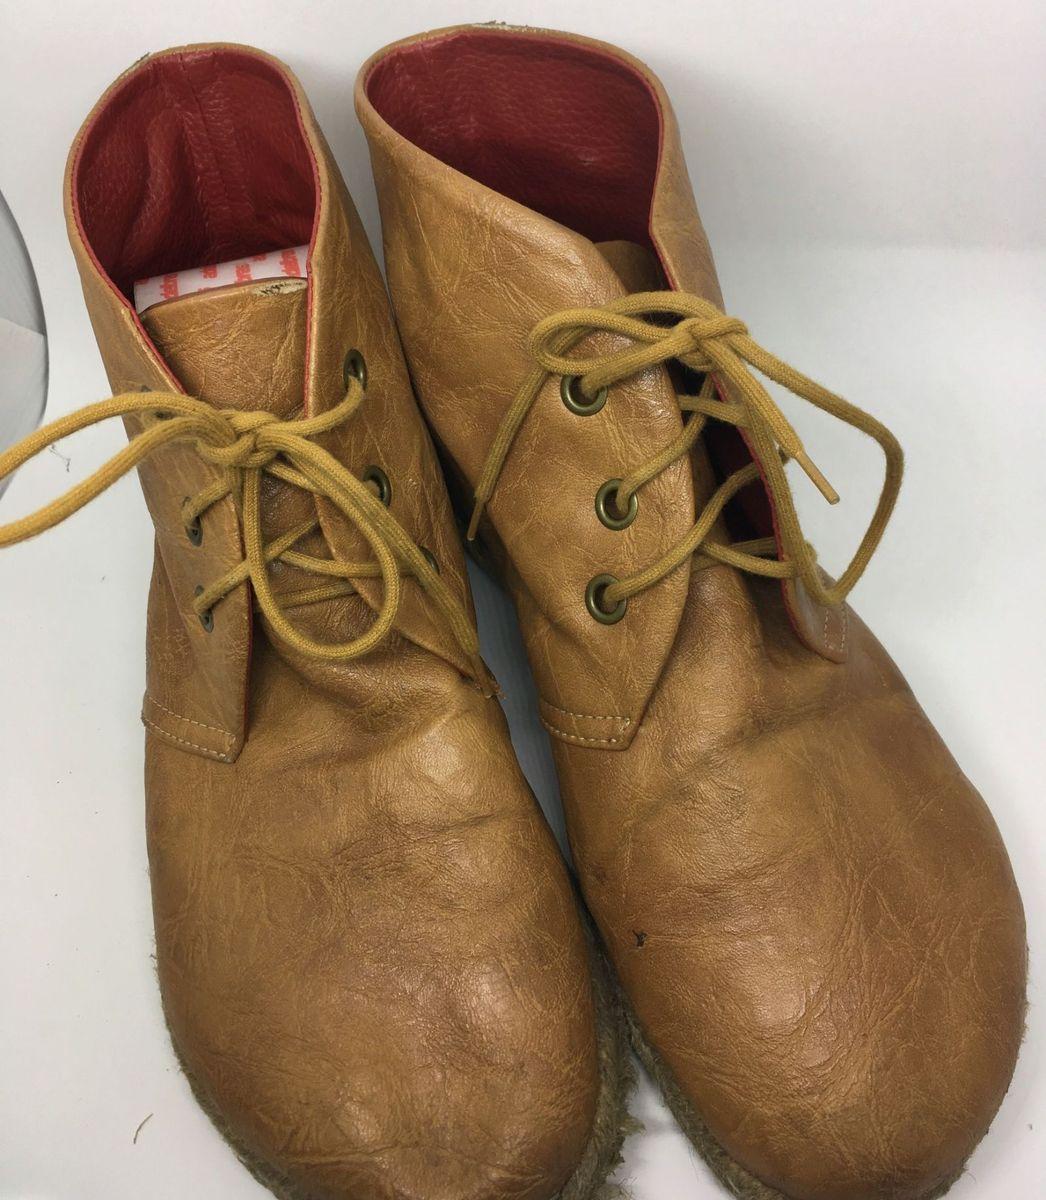 7fb31e8d9 bota couro caramelo - botas riva.  Czm6ly9wag90b3muzw5qb2vplmnvbs5ici9wcm9kdwn0cy82mzgwl2nhyjhknwfmnzq3nju3nwe2nznhyjq2ndgwmjlmota1lmpwzw  ...